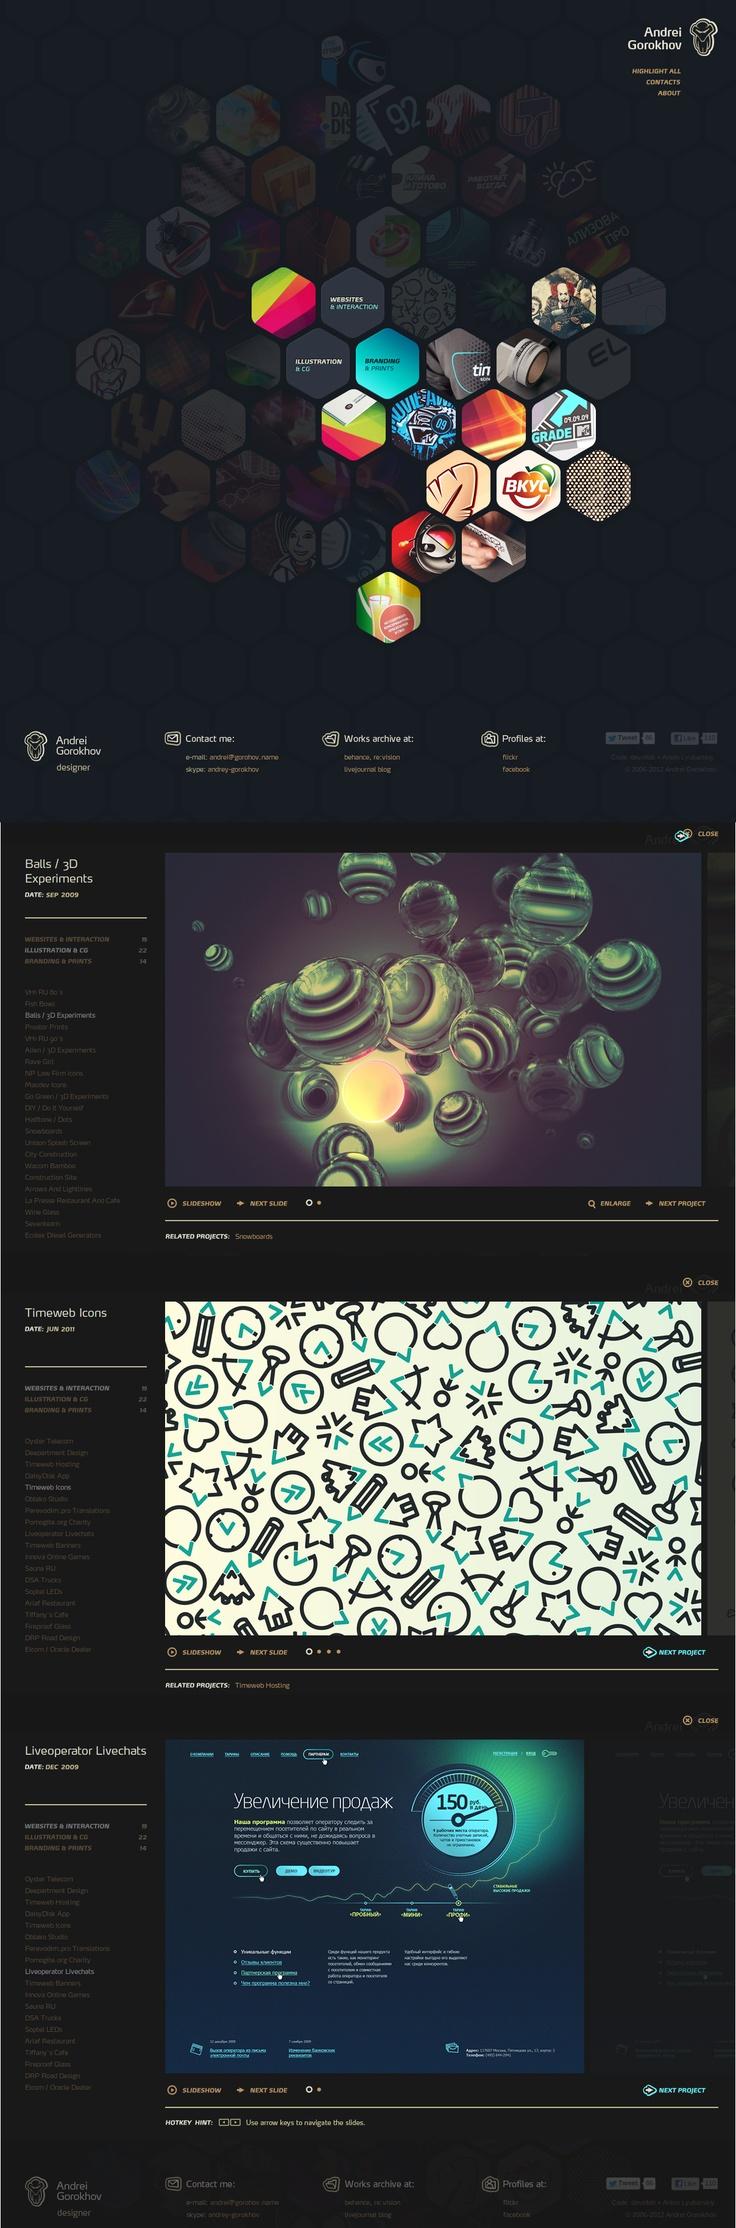 Unique Web Design, Andrei Gorokhov #WebDesign #Design (http://www.pinterest.com/aldenchong/)